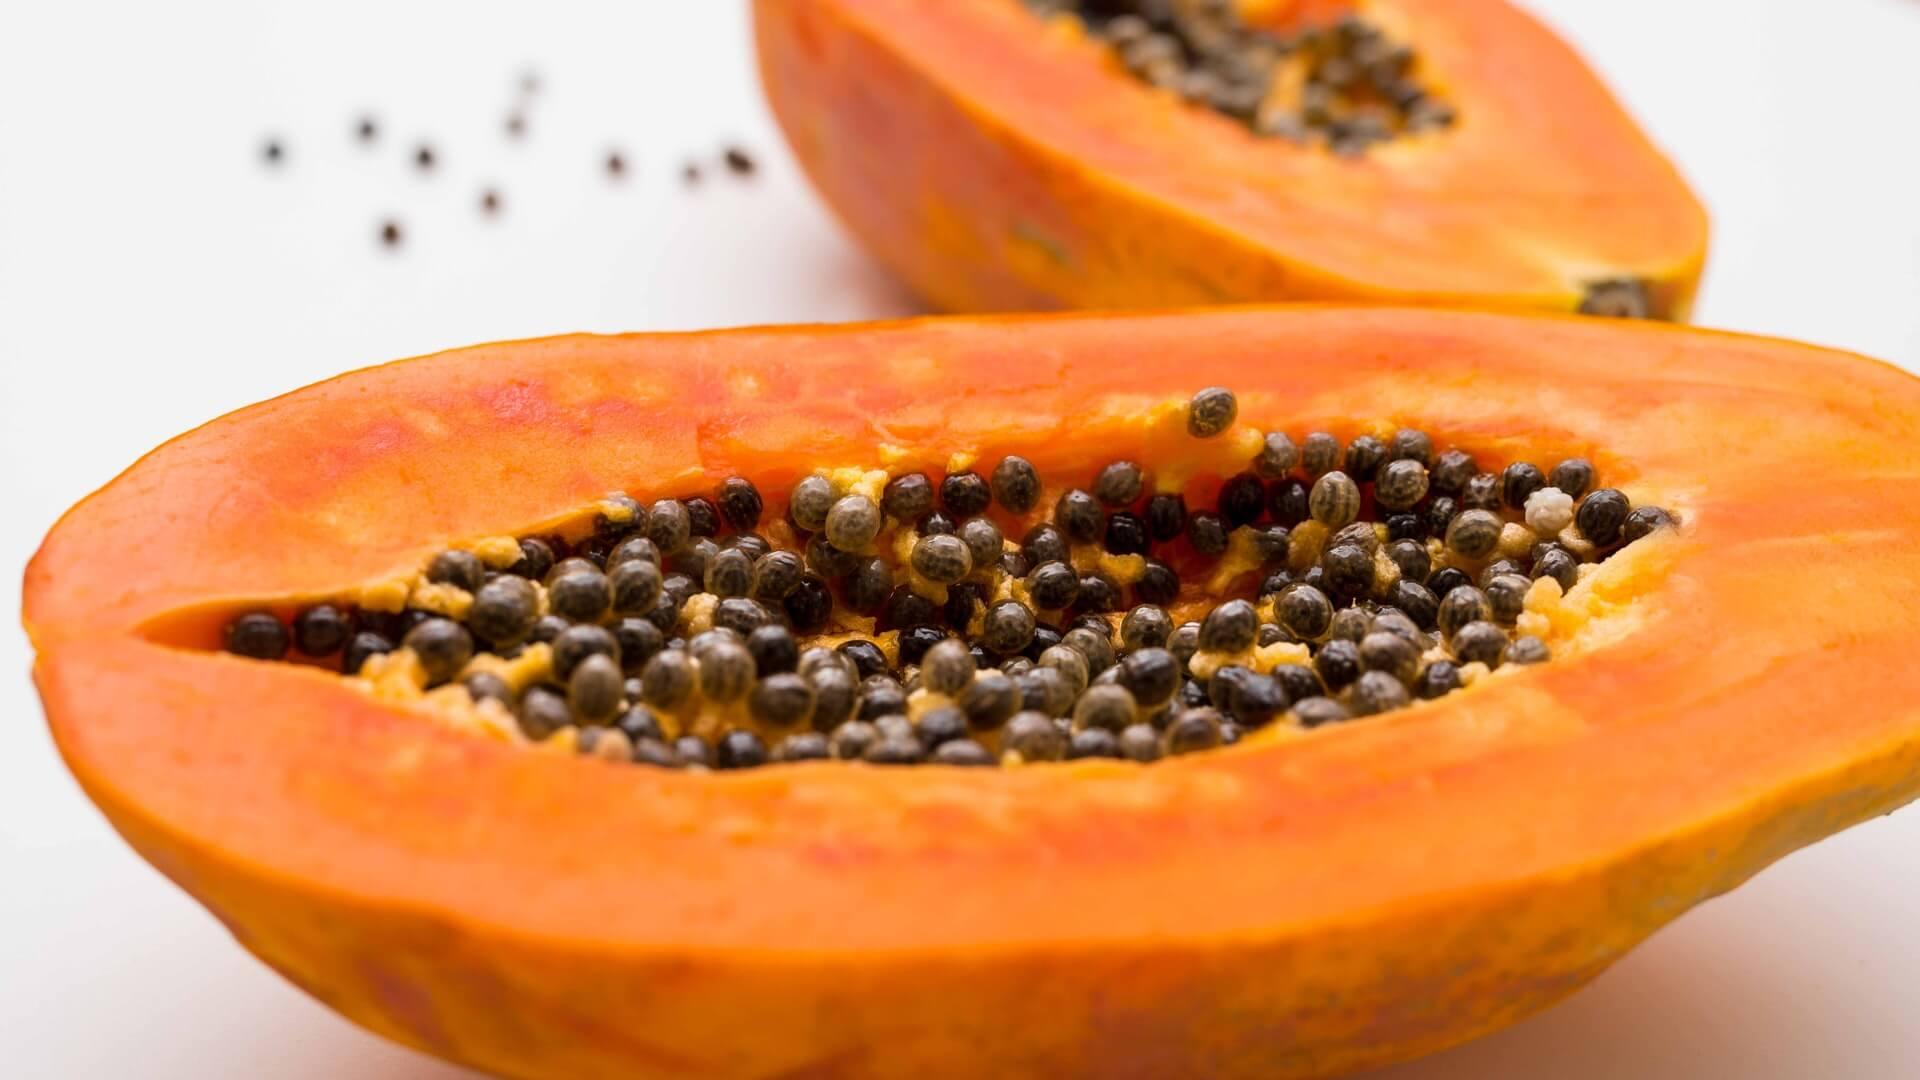 Fruta de papaya.